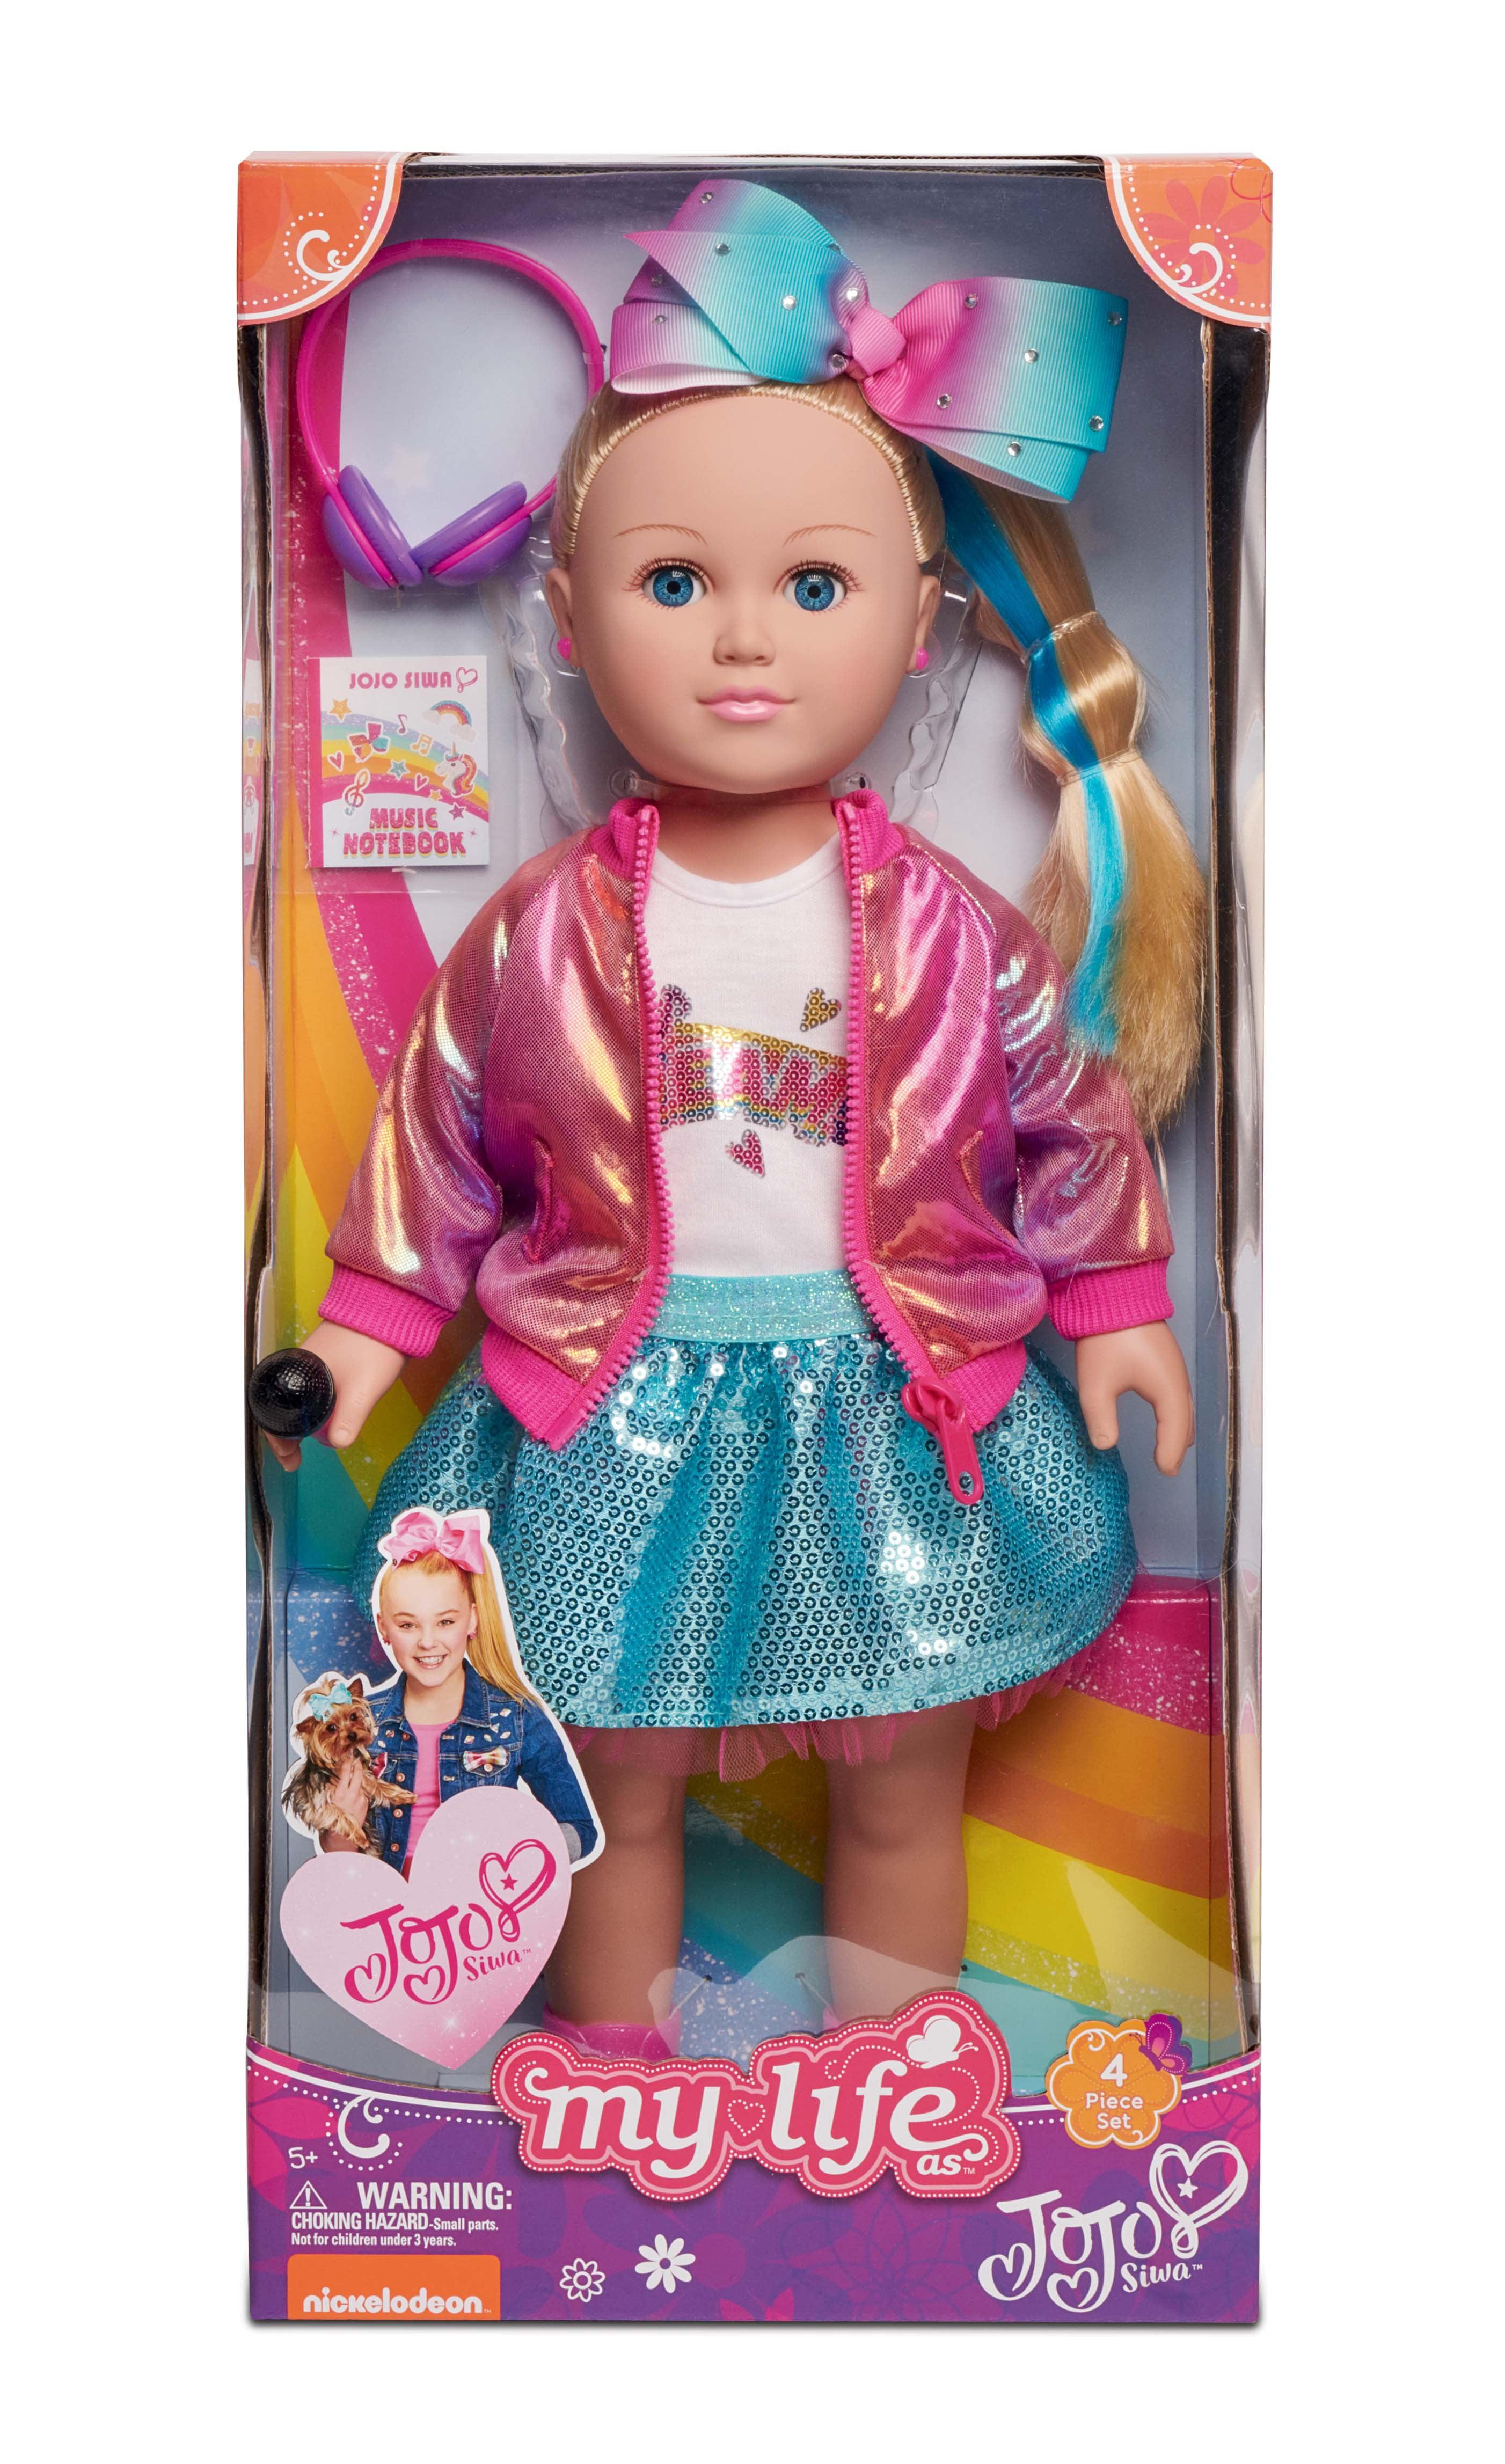 46551588dd My Life As JoJo Siwa Doll, 18-inch Soft Torso Doll with Blonde Hair, Dance  Party 2019 Release - Walmart.com